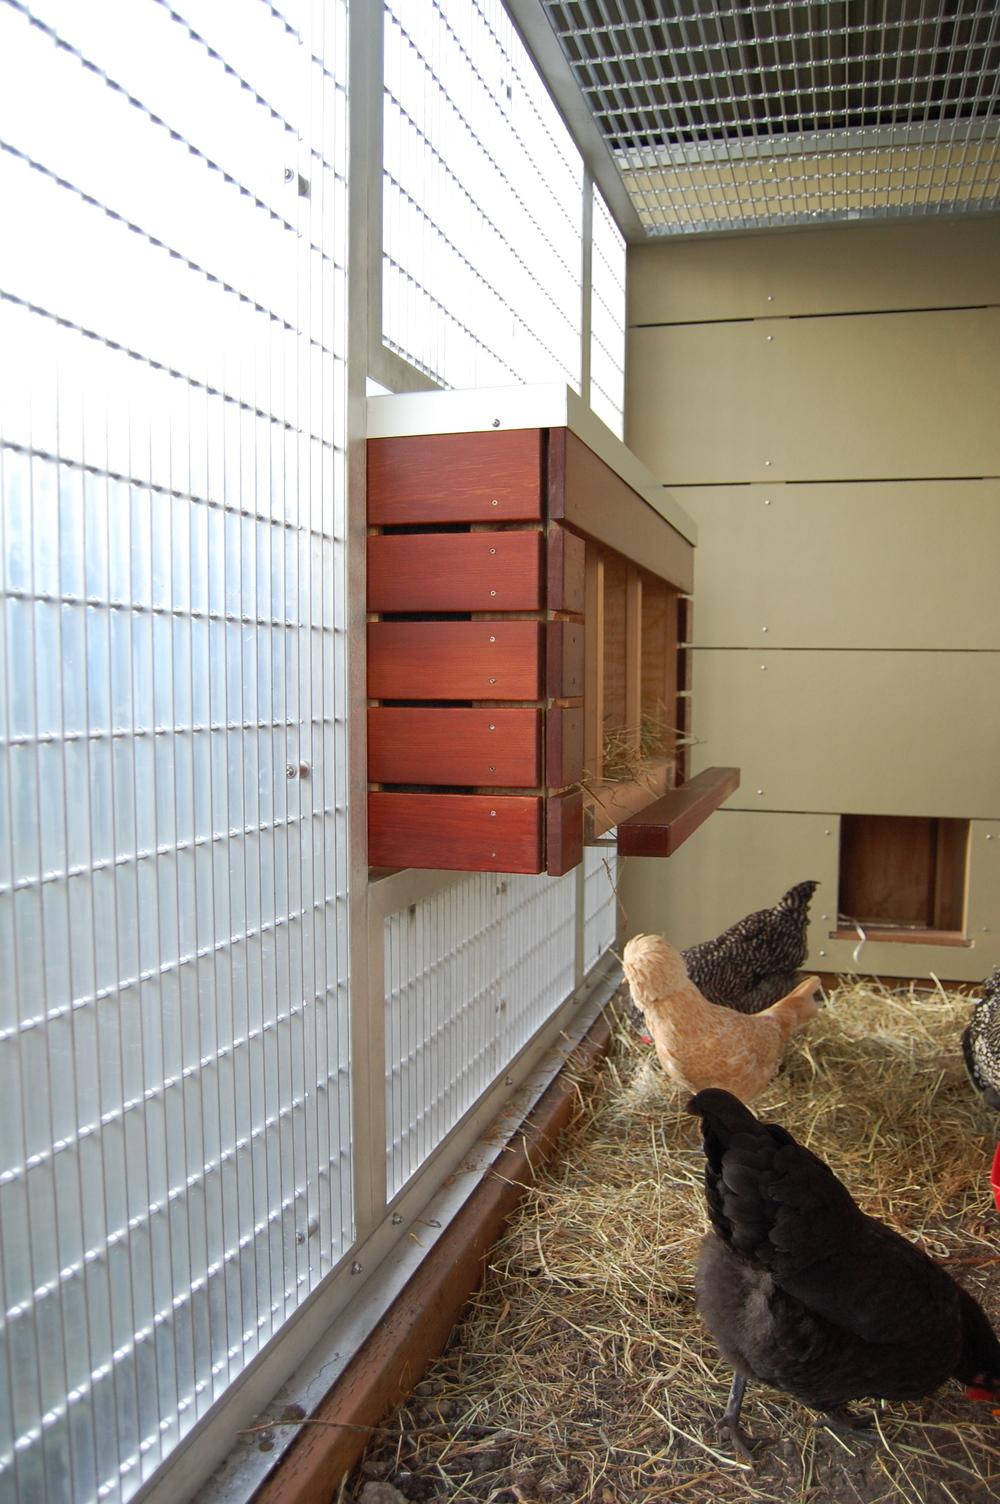 Aluminum chicken coop with a cedar nesting box  Designed by Eggleston Farkas Architecture